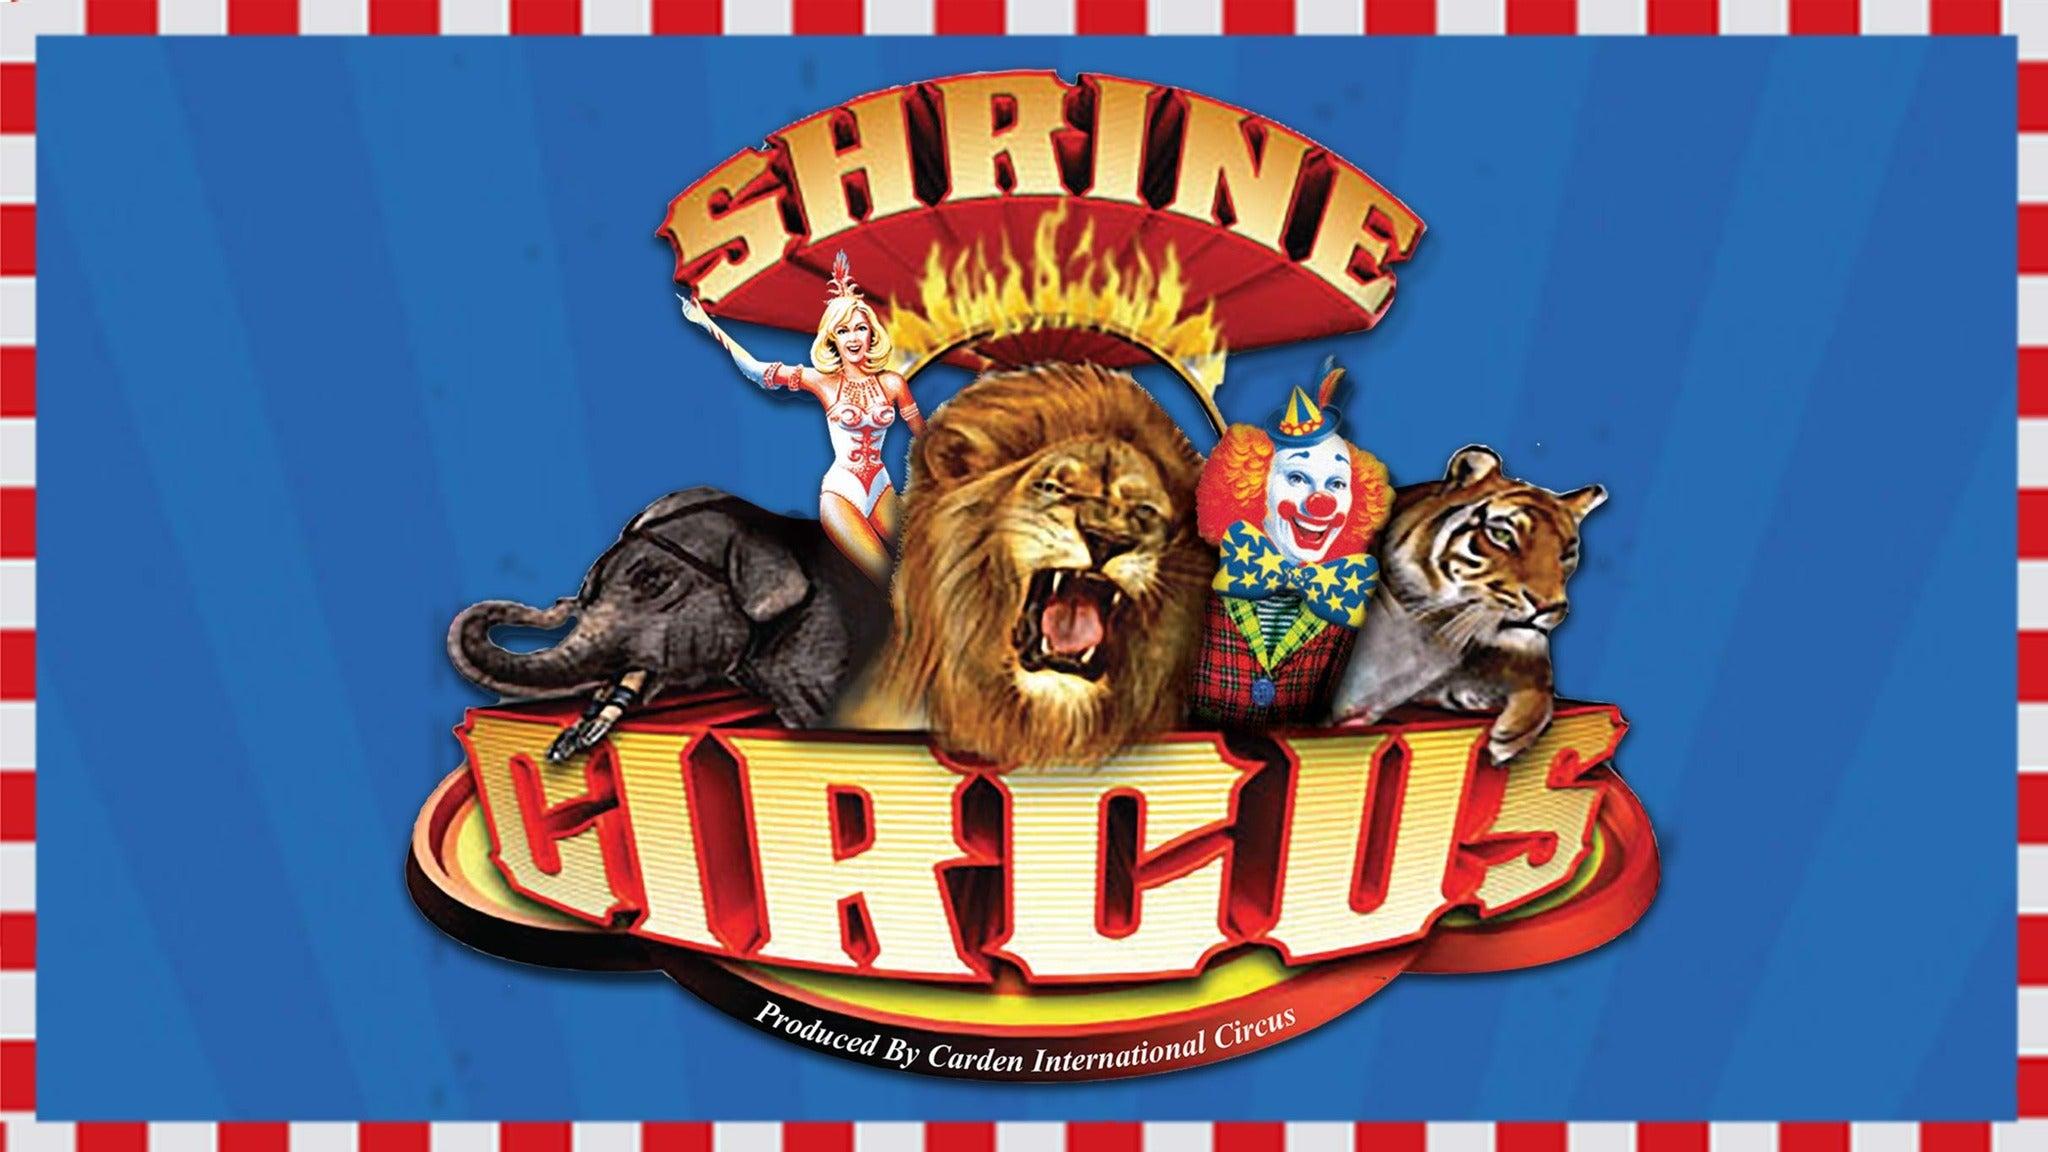 Austin Shrine Circus